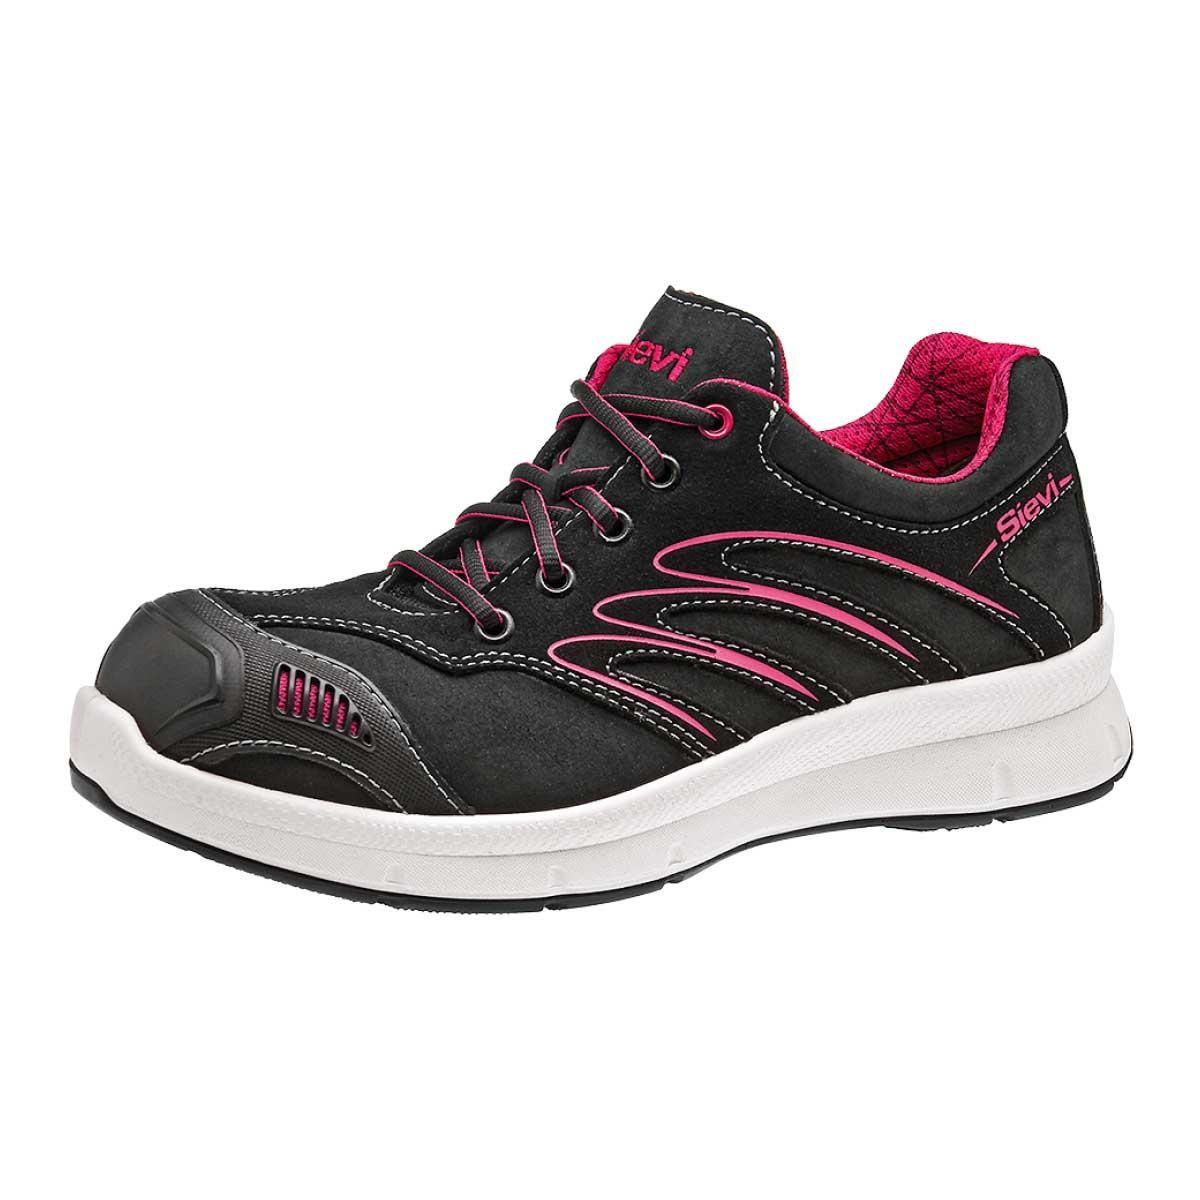 Grounding Shoes Uk